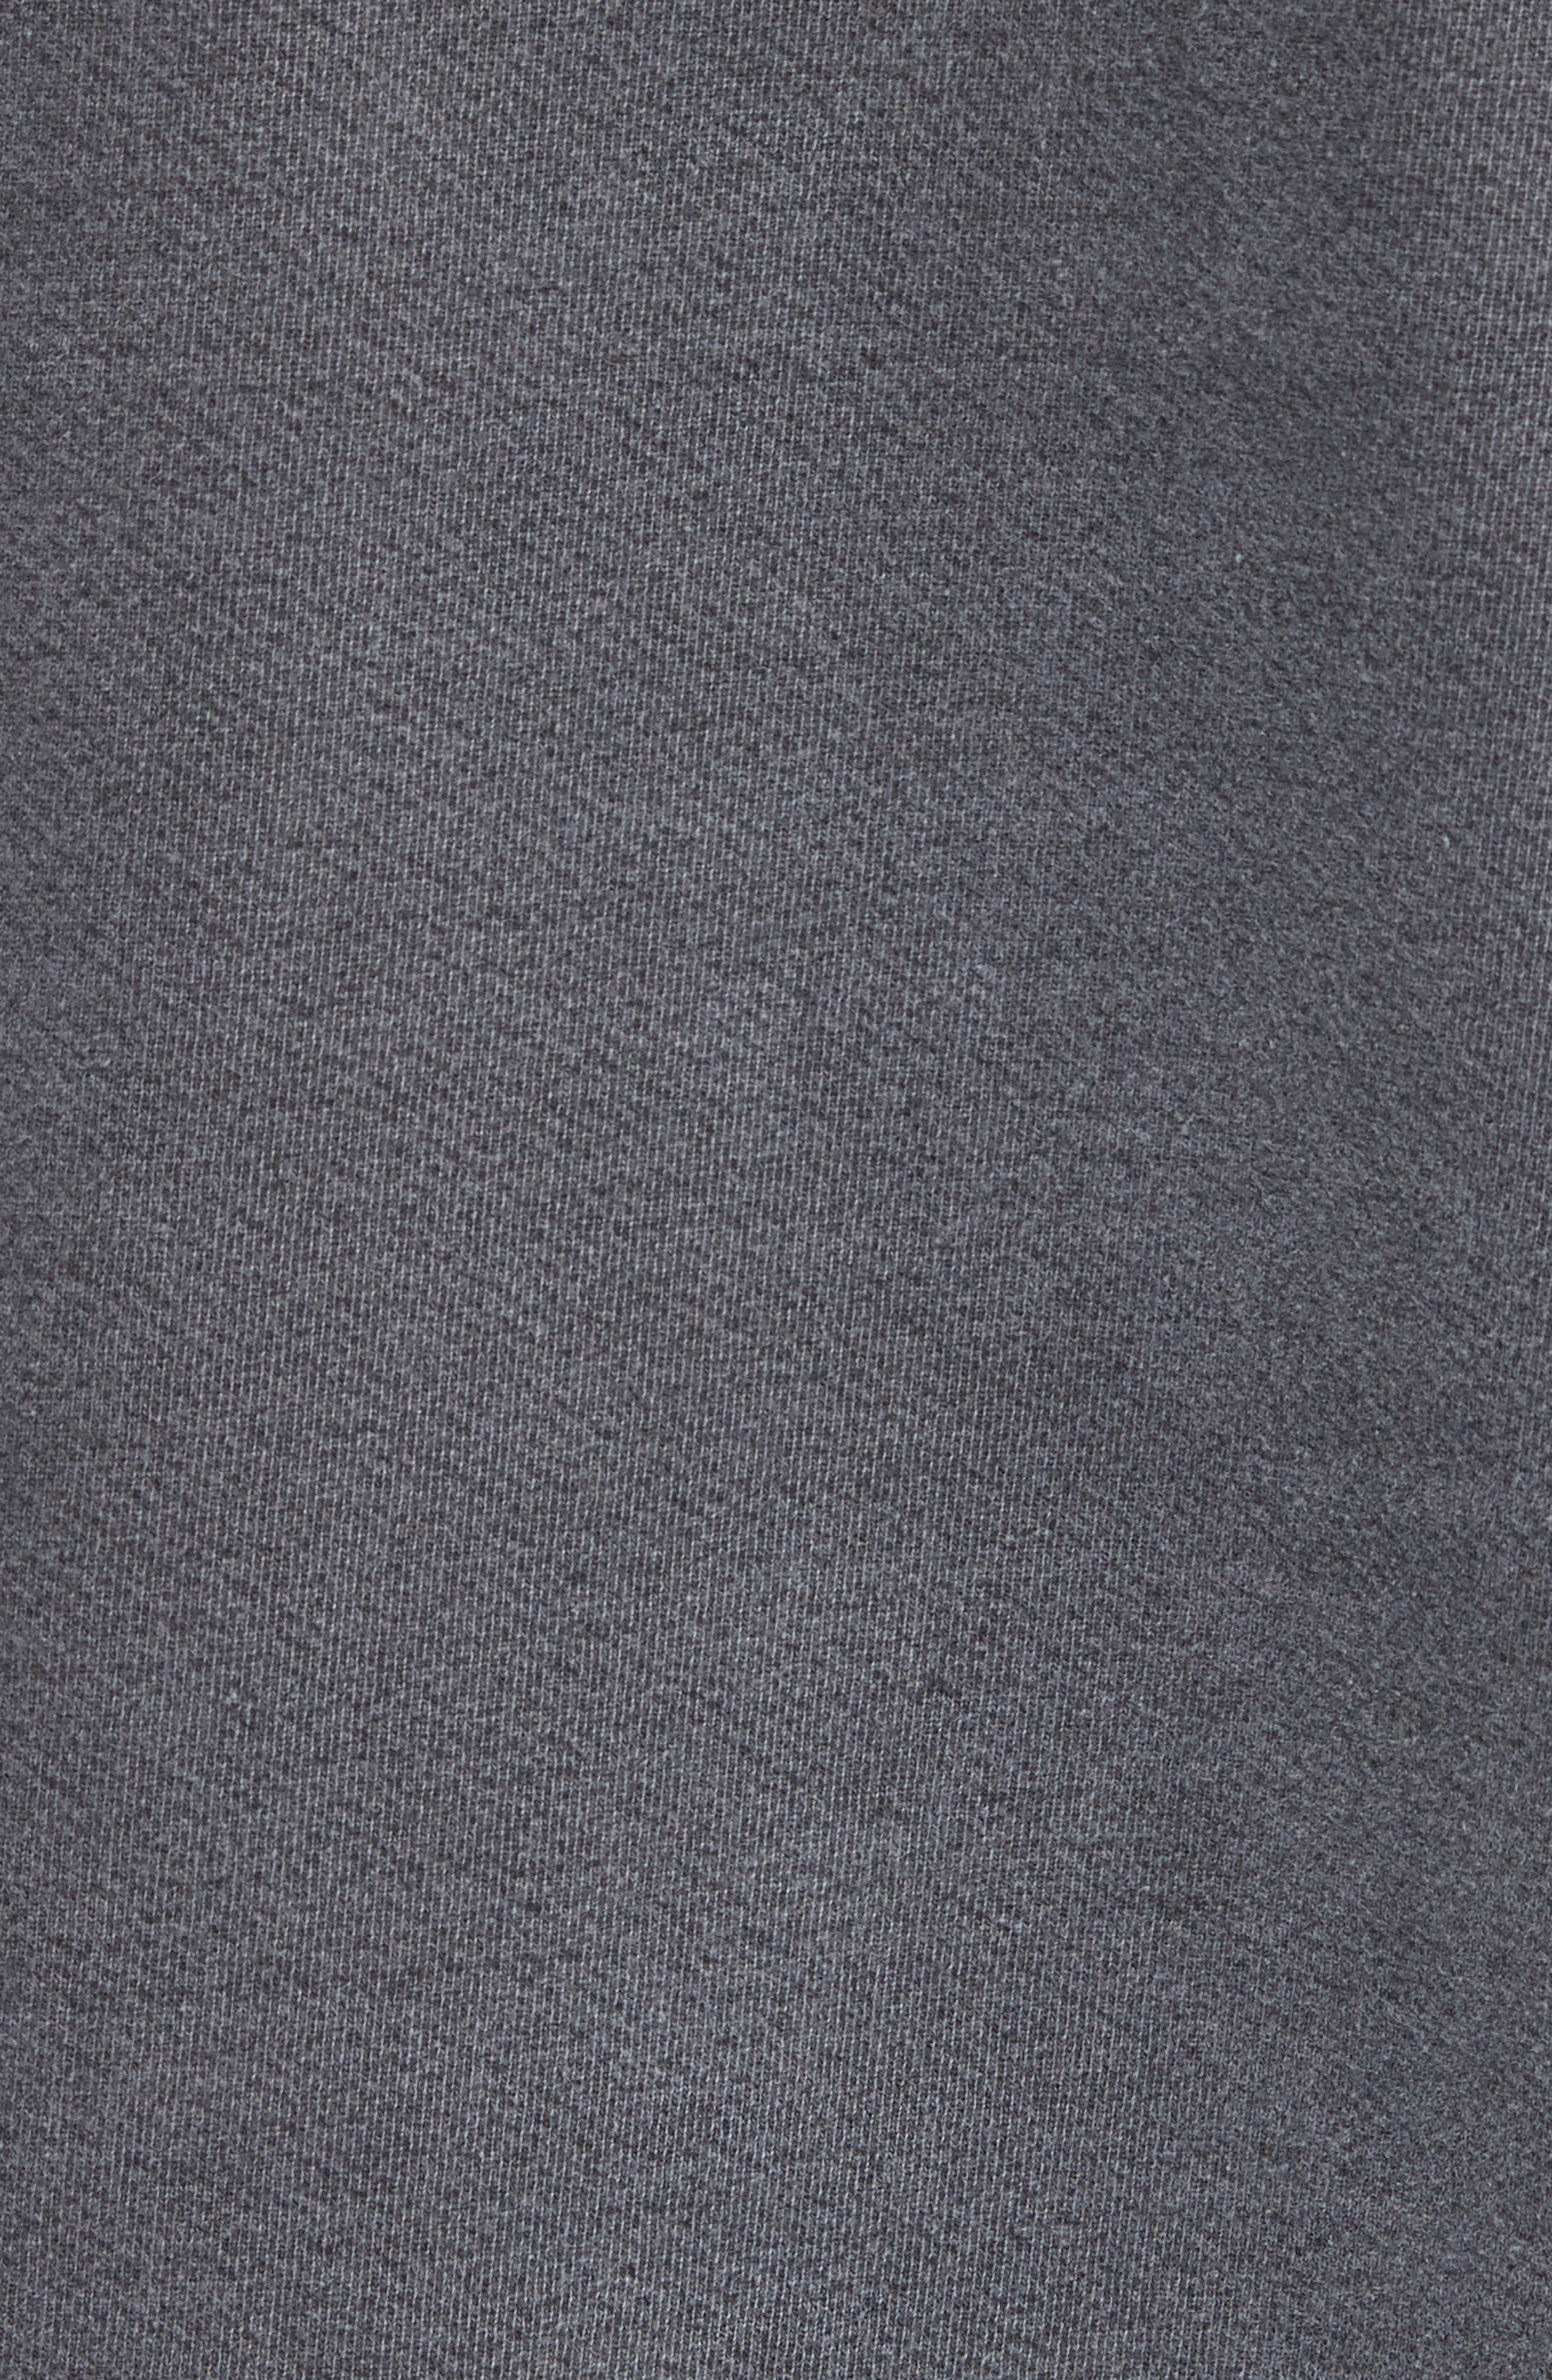 Norton Sweatshirt,                             Alternate thumbnail 5, color,                             Black Pigment